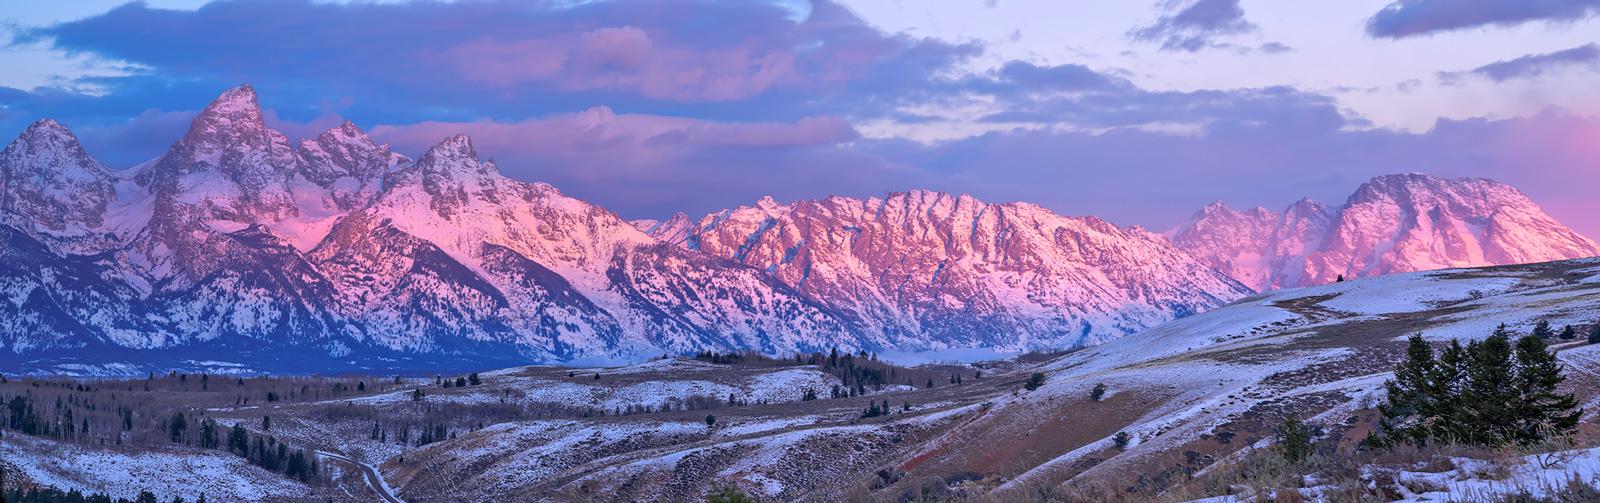 Grand Teton,Wyoming,sunrise,Gros Ventre, photo